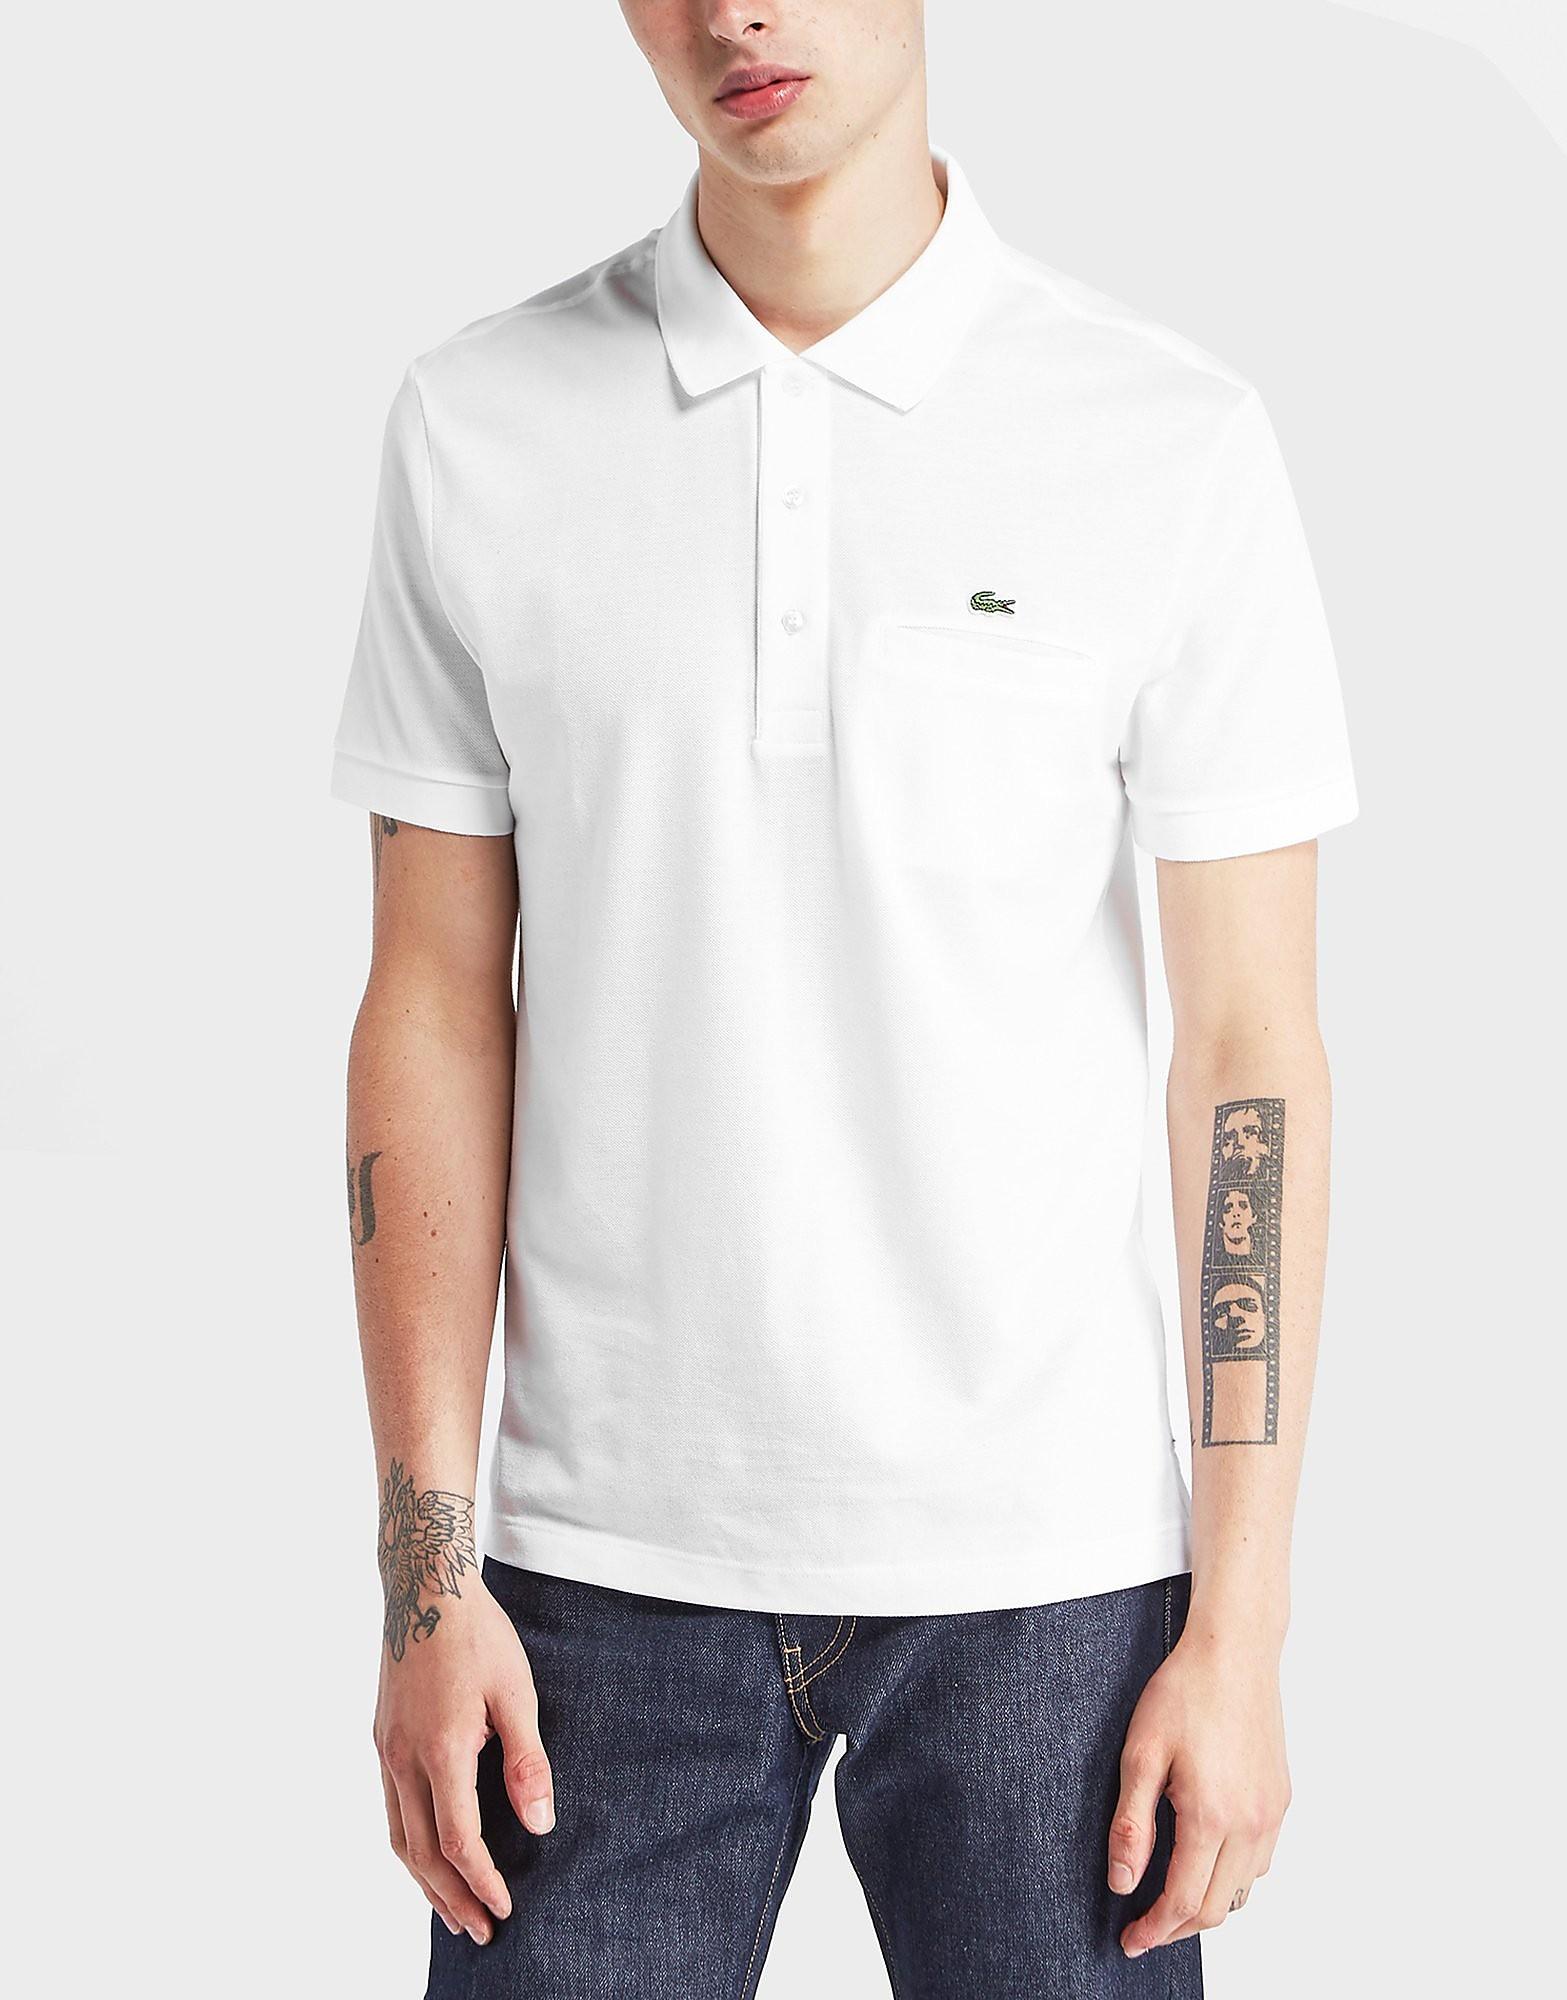 Lacoste Pocket Polo Shirt